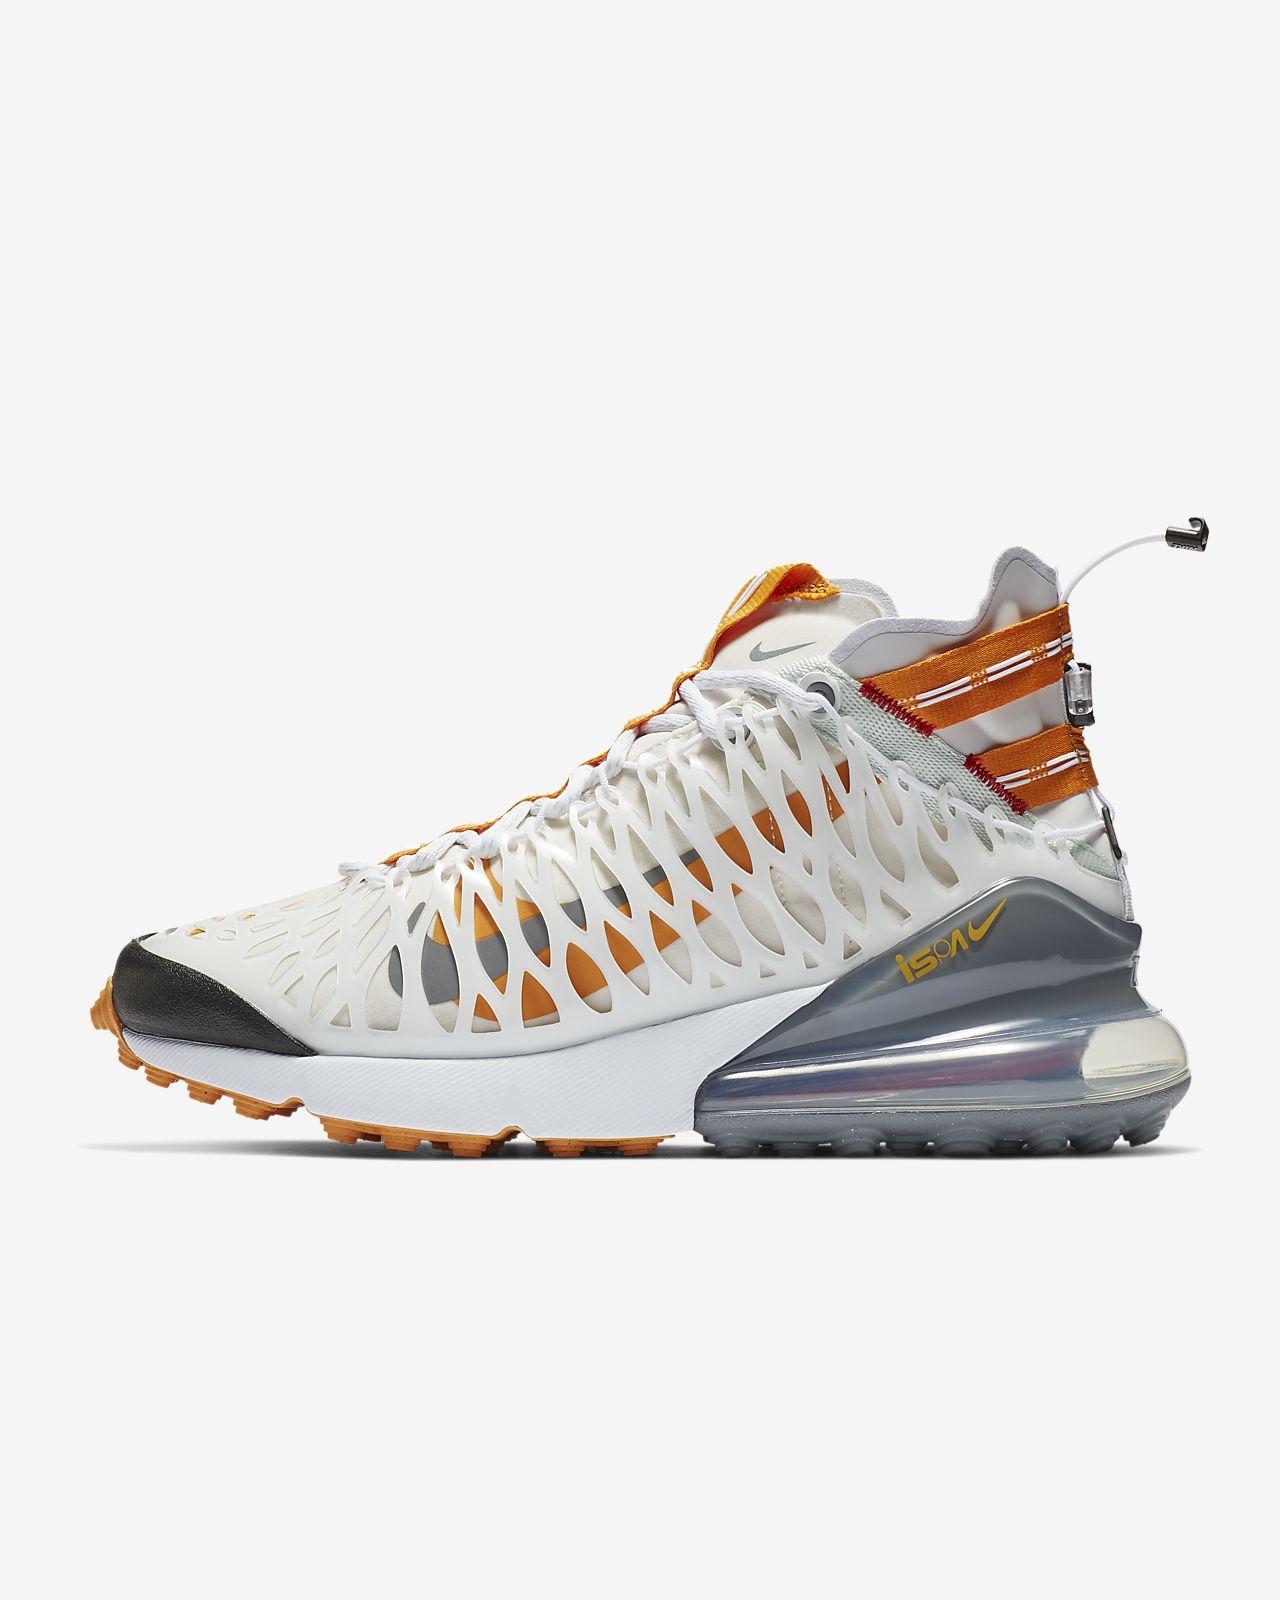 b8771a0ed2b7e Nike Air Max 270 ISPA Men's Shoe. Nike.com IE